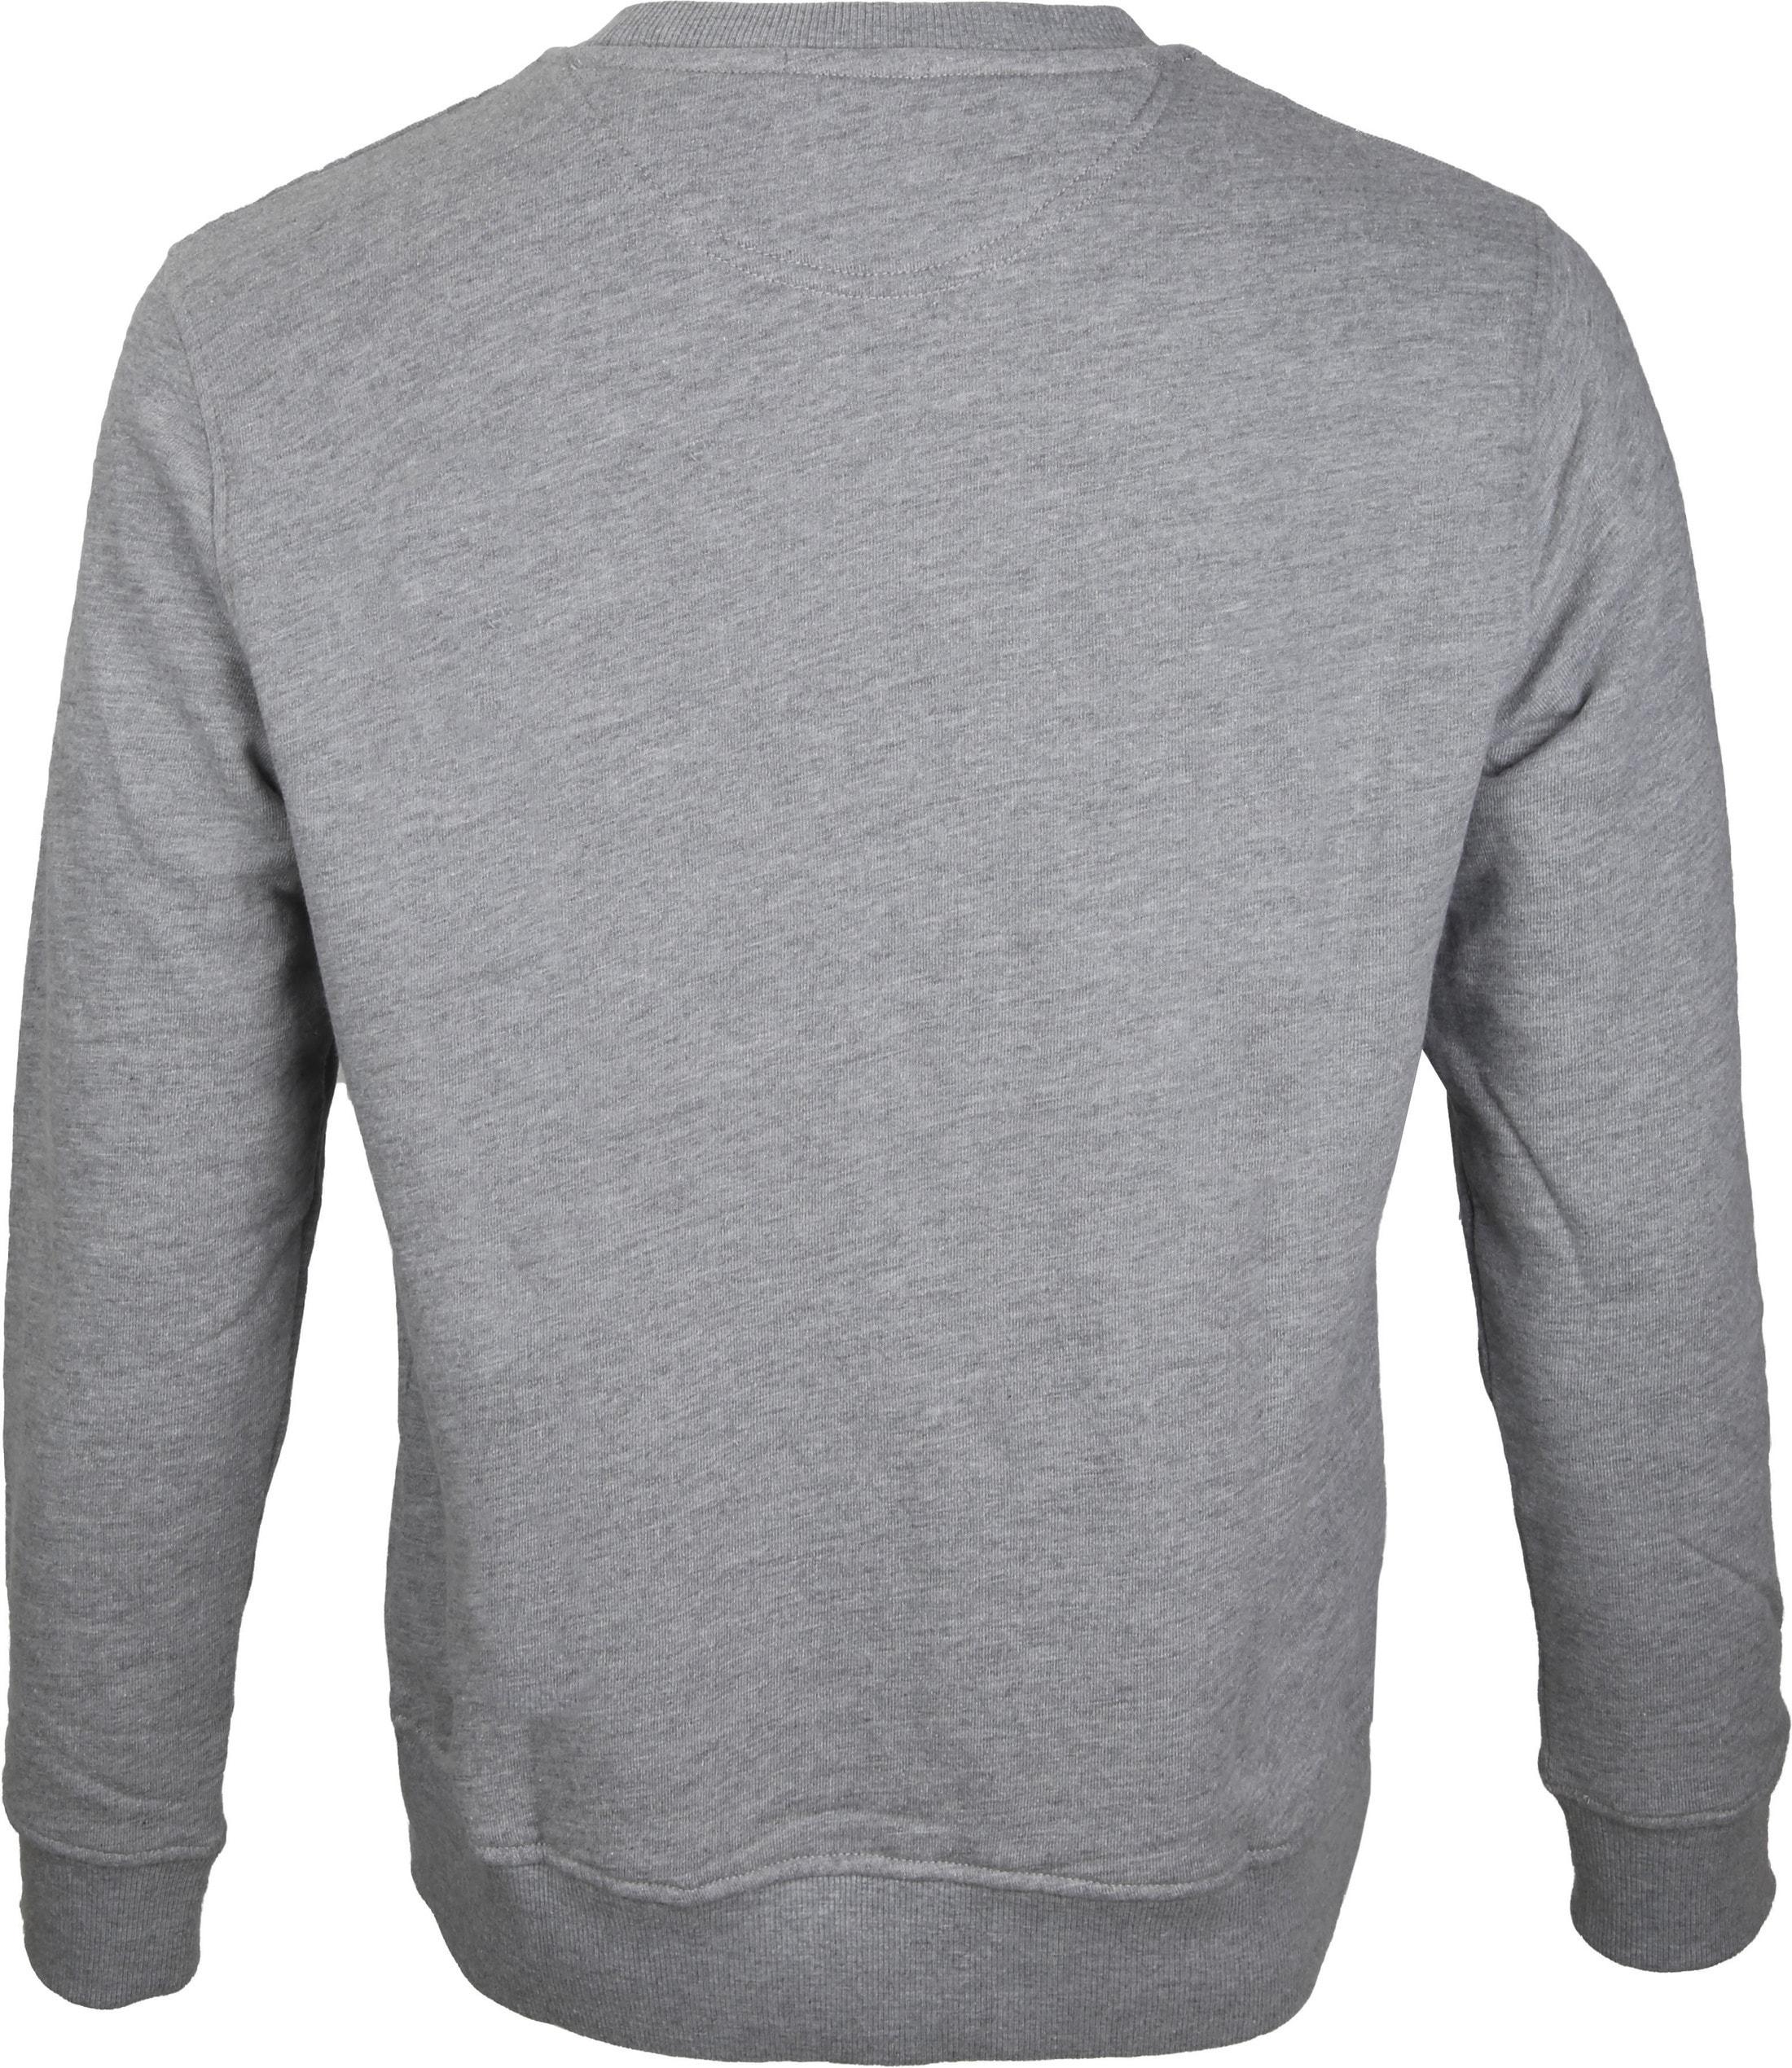 Timberland Sweater Grau Logo foto 2